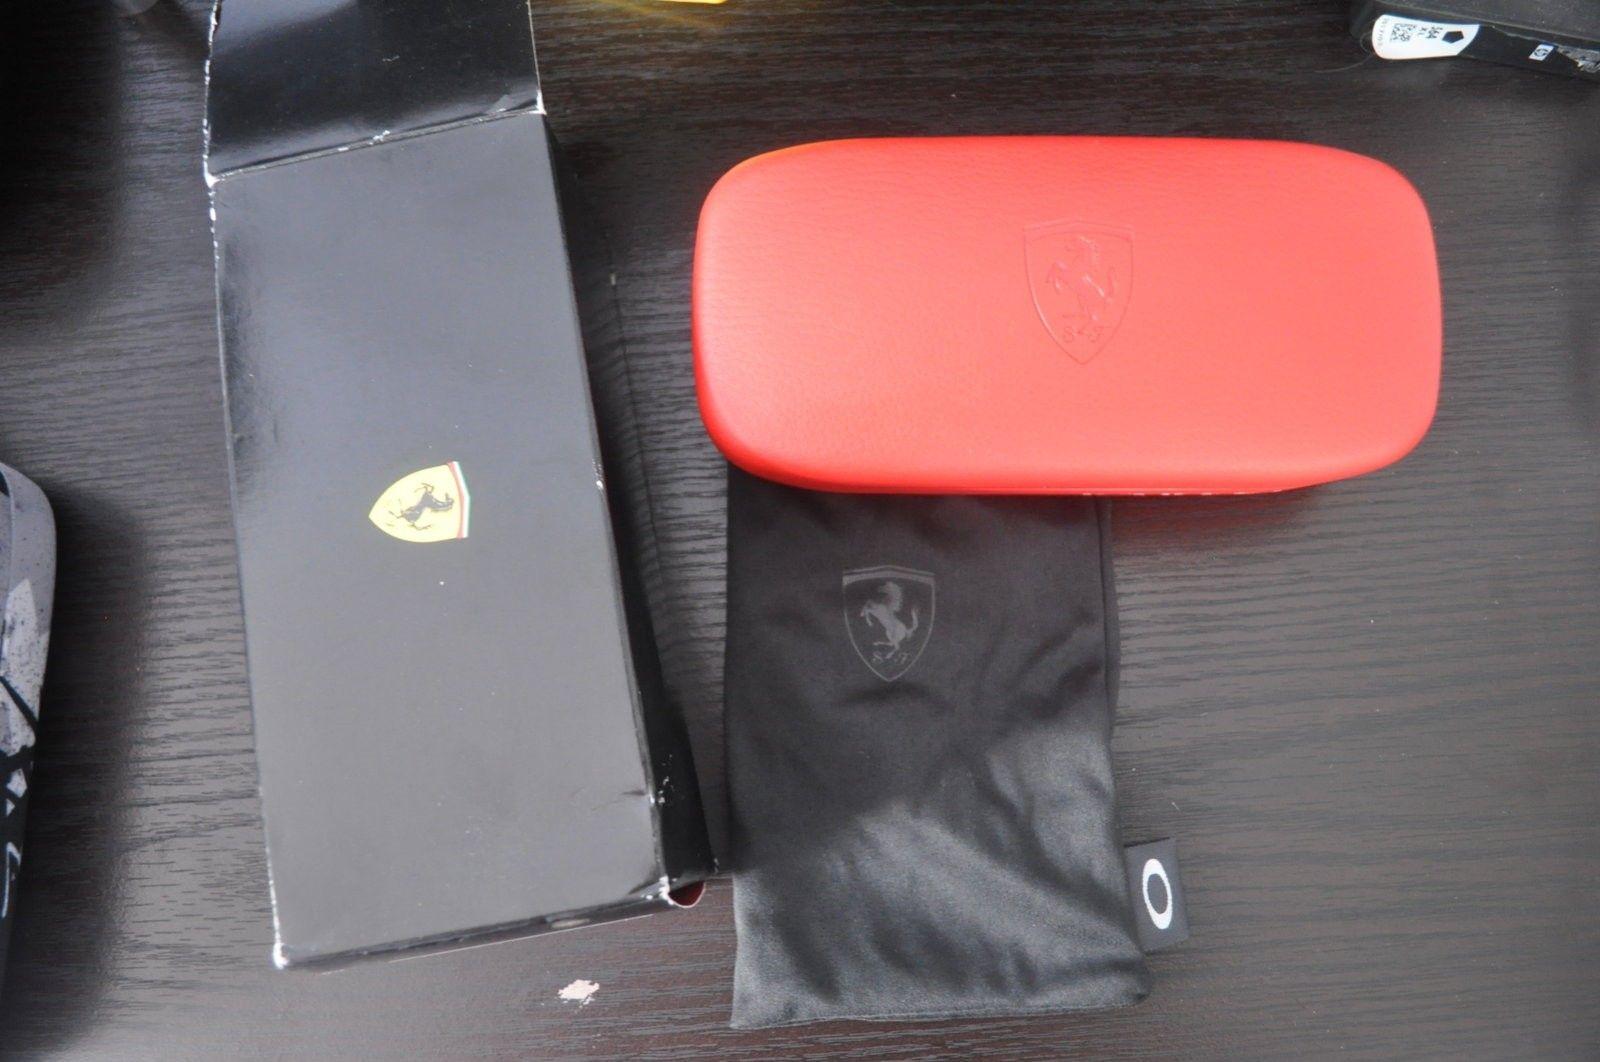 B1B Micro, Family Member Micro, Others, Ferrari Box, Case, micro - DSC_0157.JPG